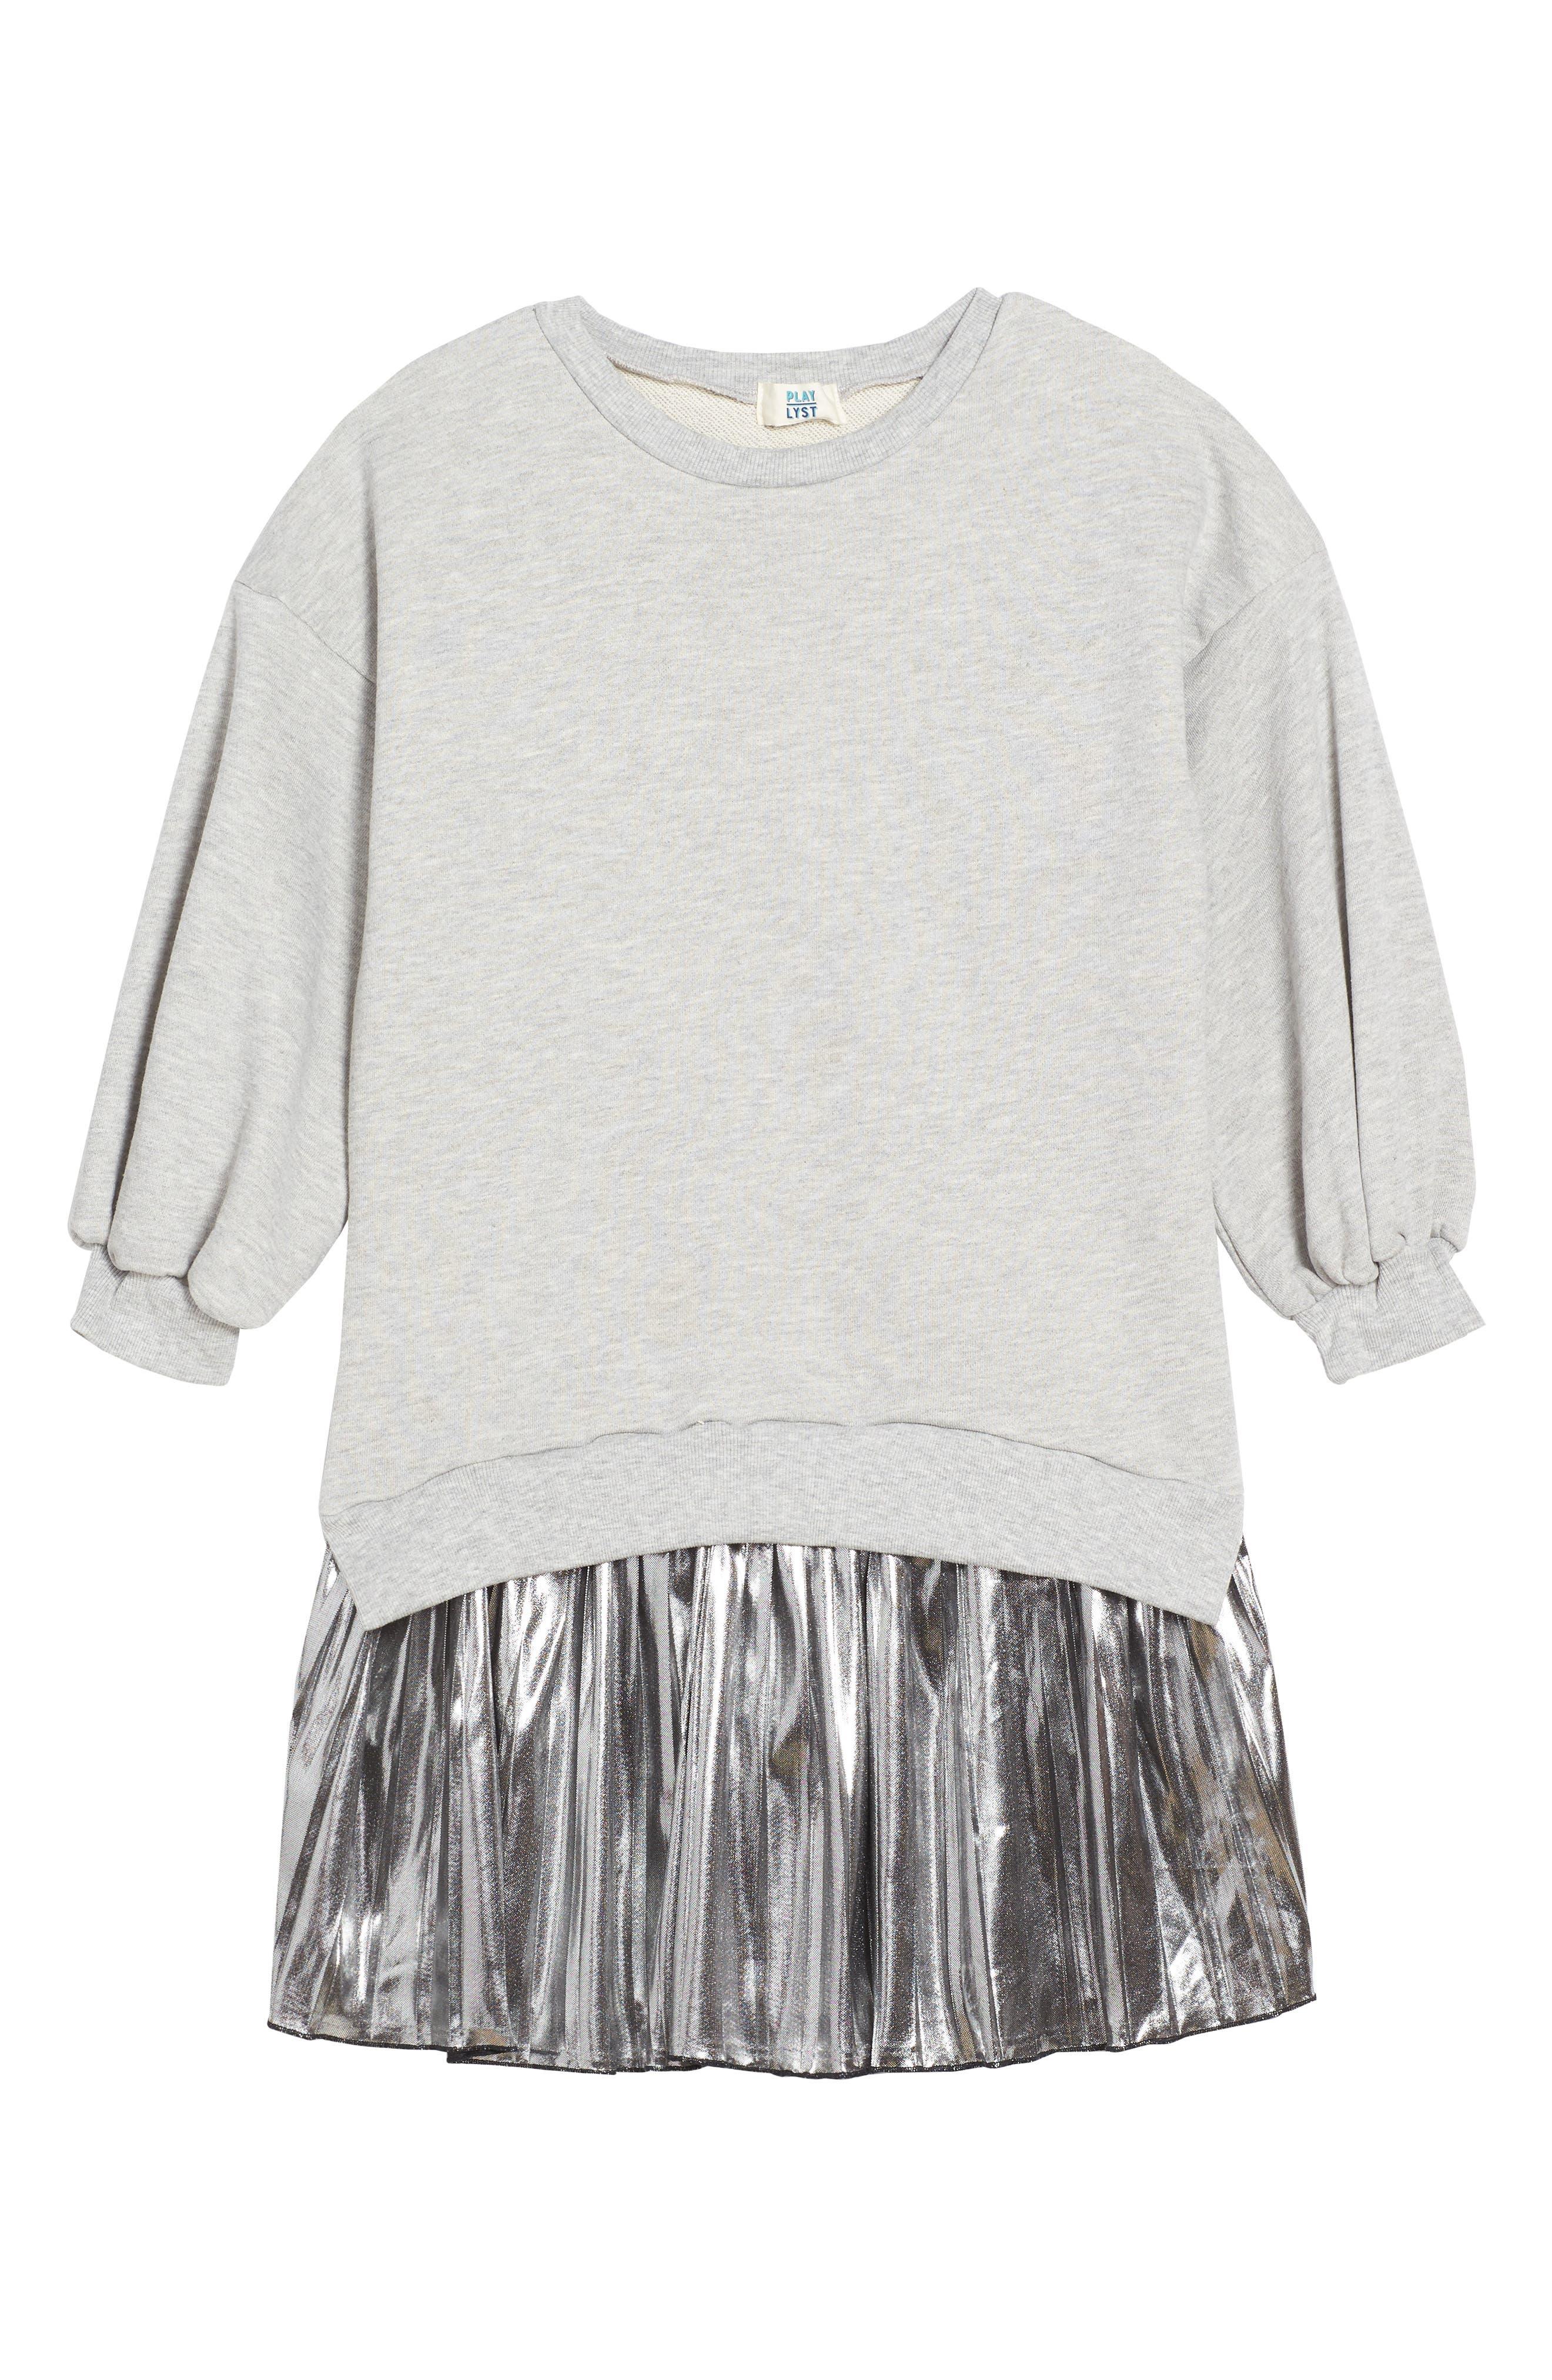 Main Image - PLAY LYST Metallic Sweatshirt Dress (Big Girls)